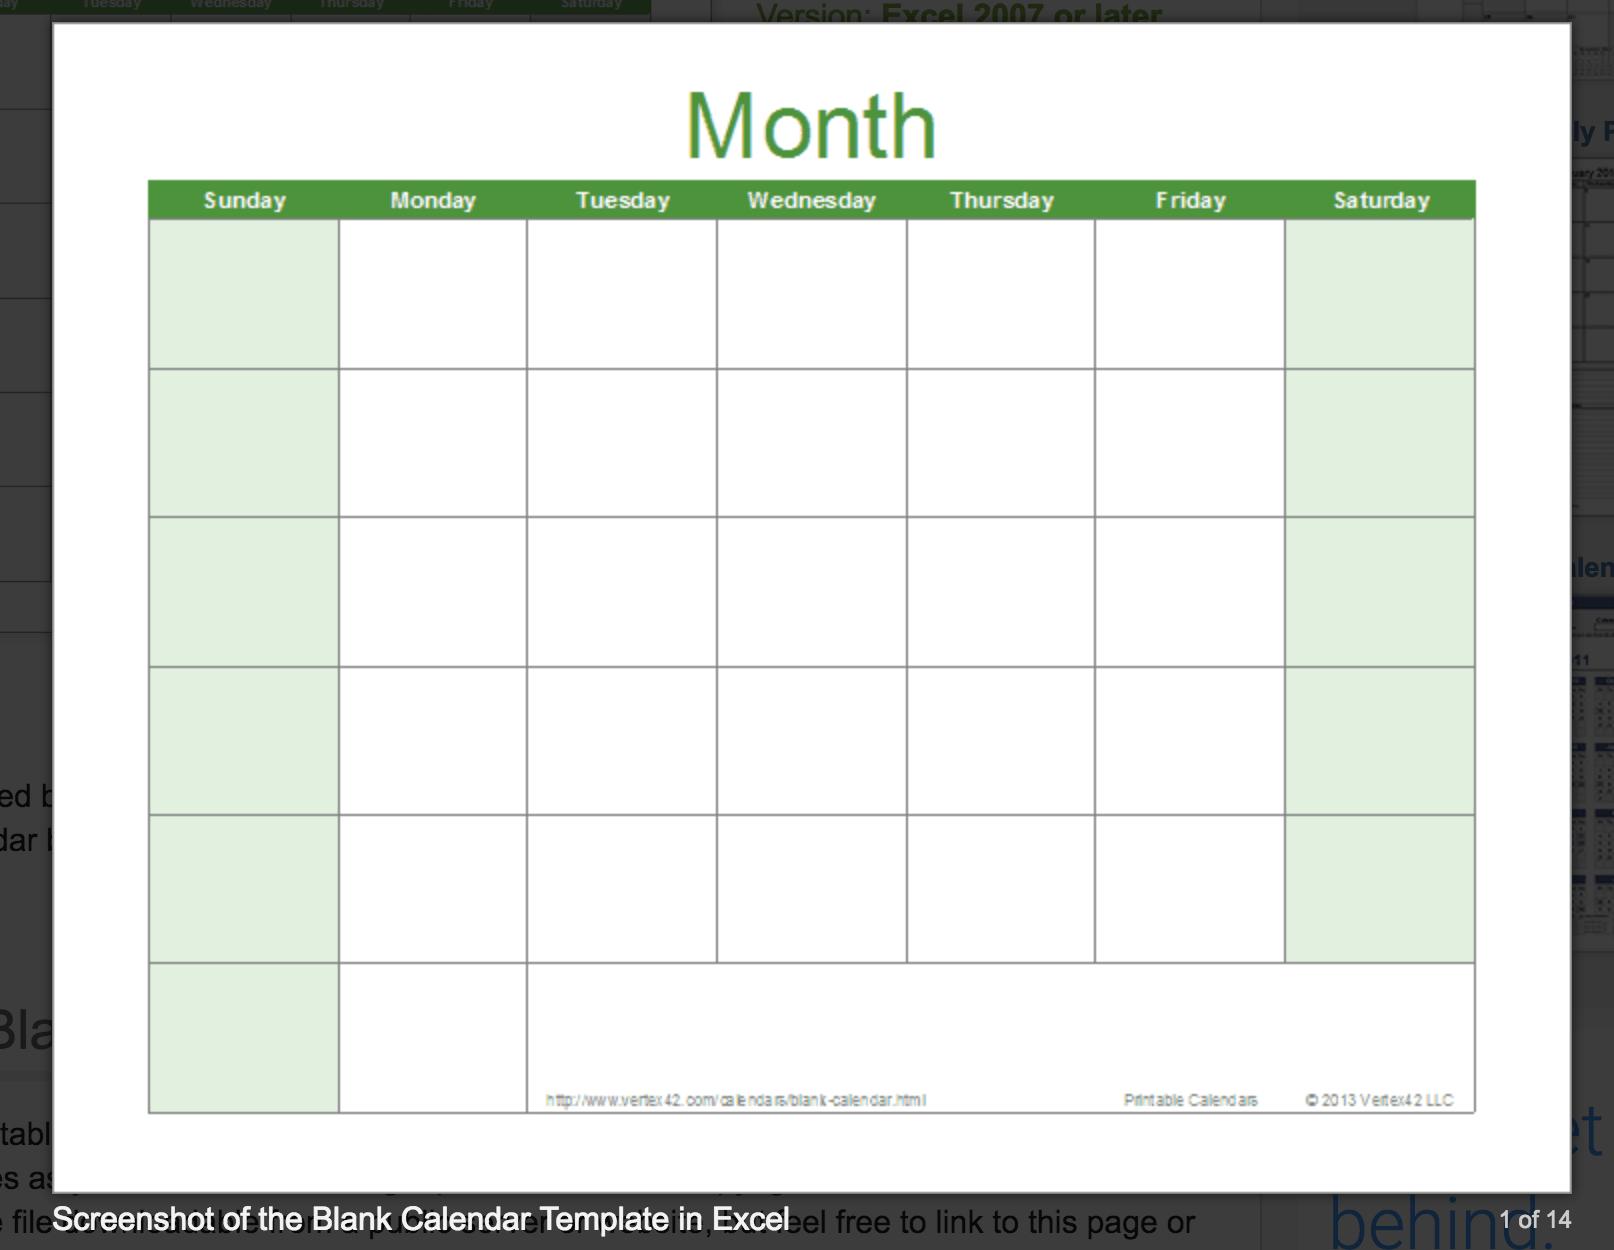 Printable Blank Calendar Templates  Free Printable And Editable Weekly Calendar